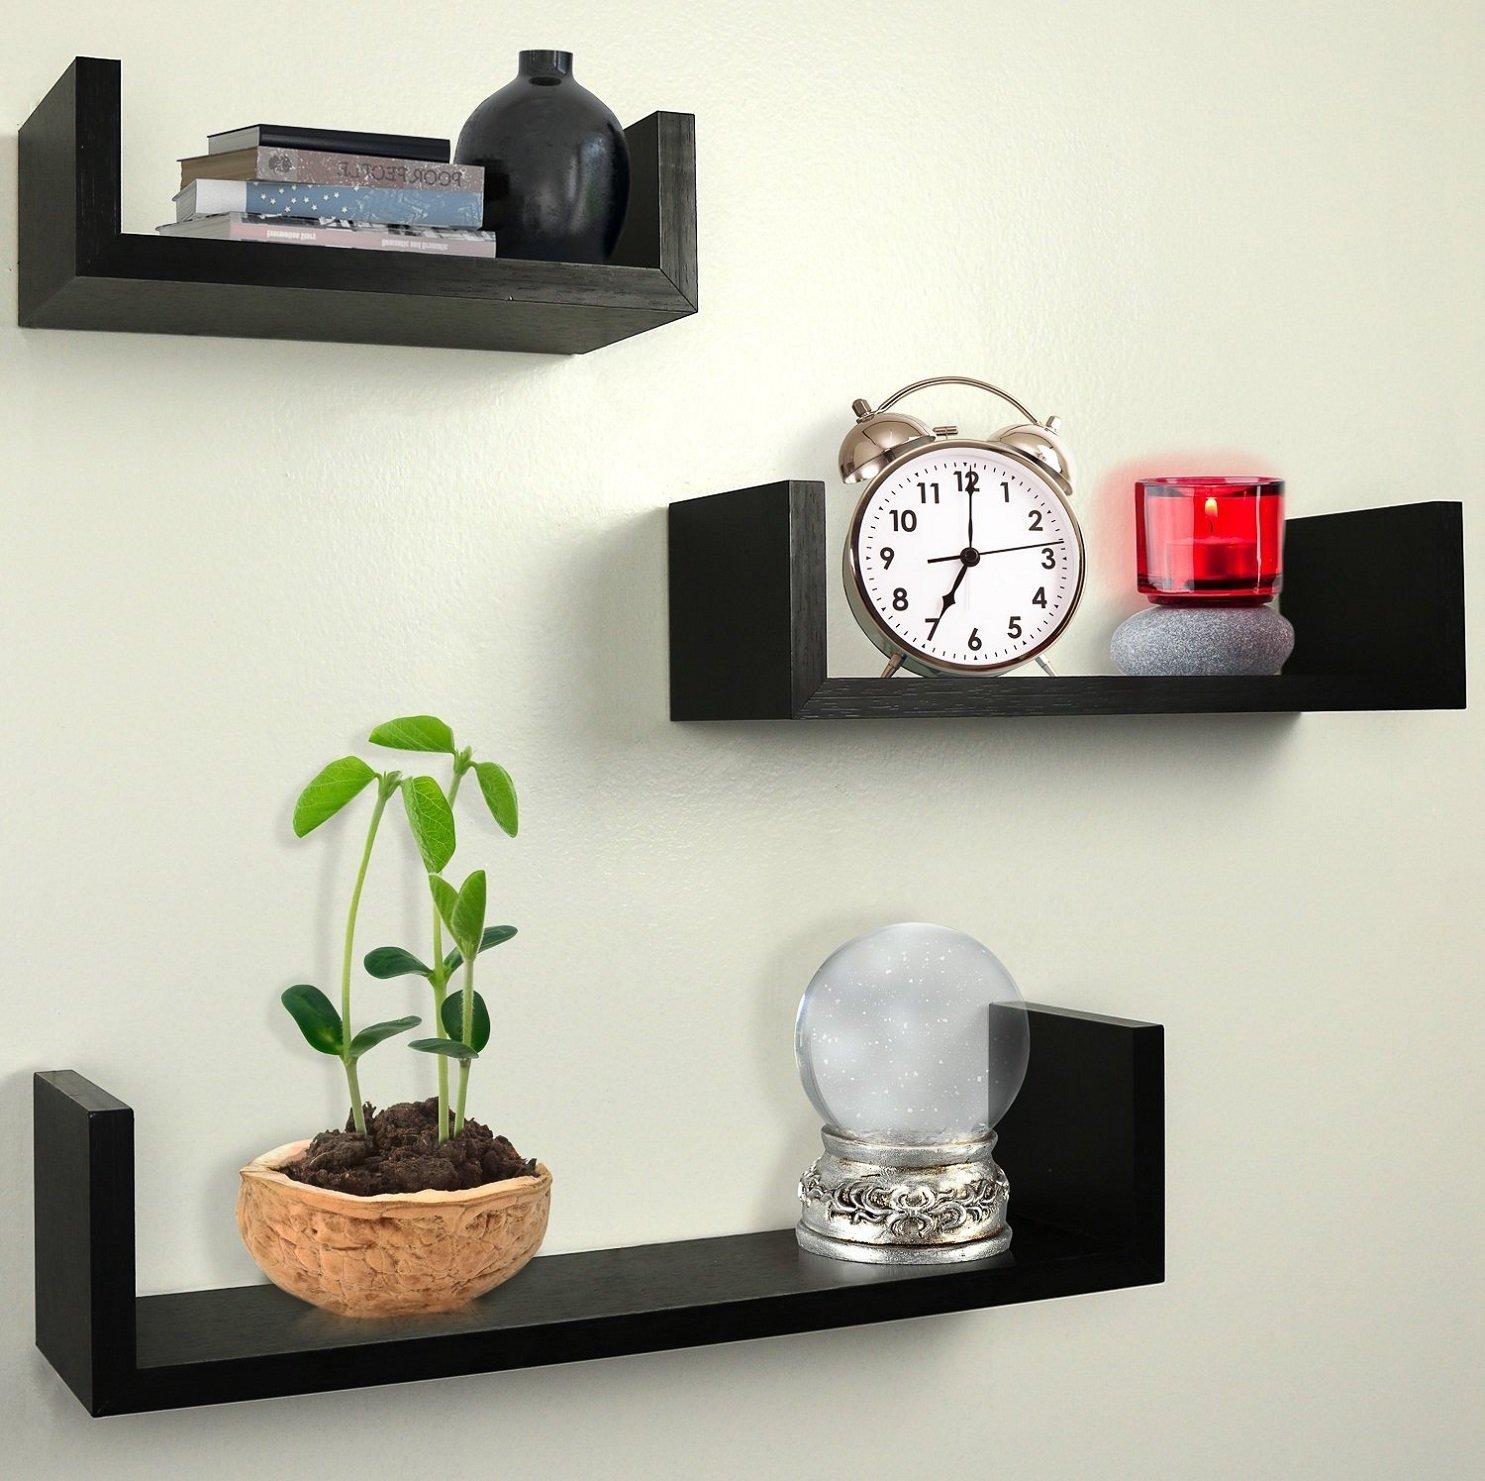 floating wall shelves - photo #34